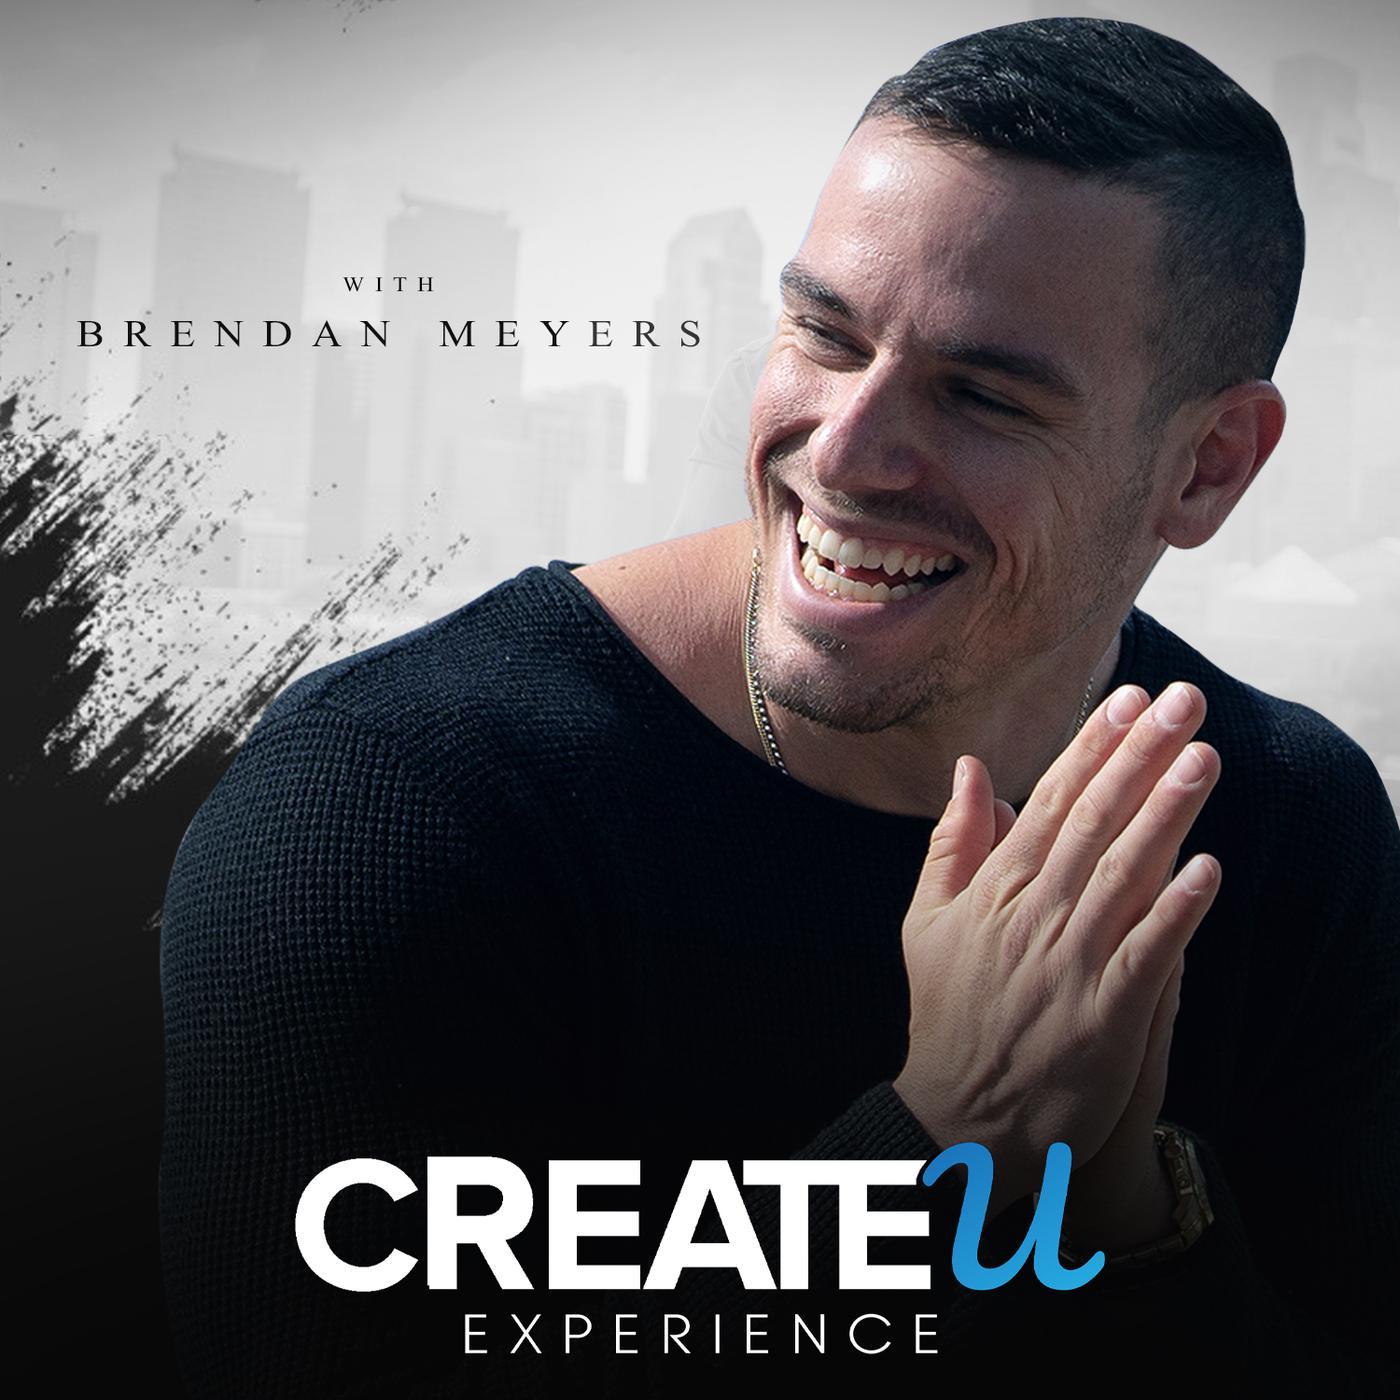 The CreateU Experience (podcast) - Brendan Meyers | Listen Notes